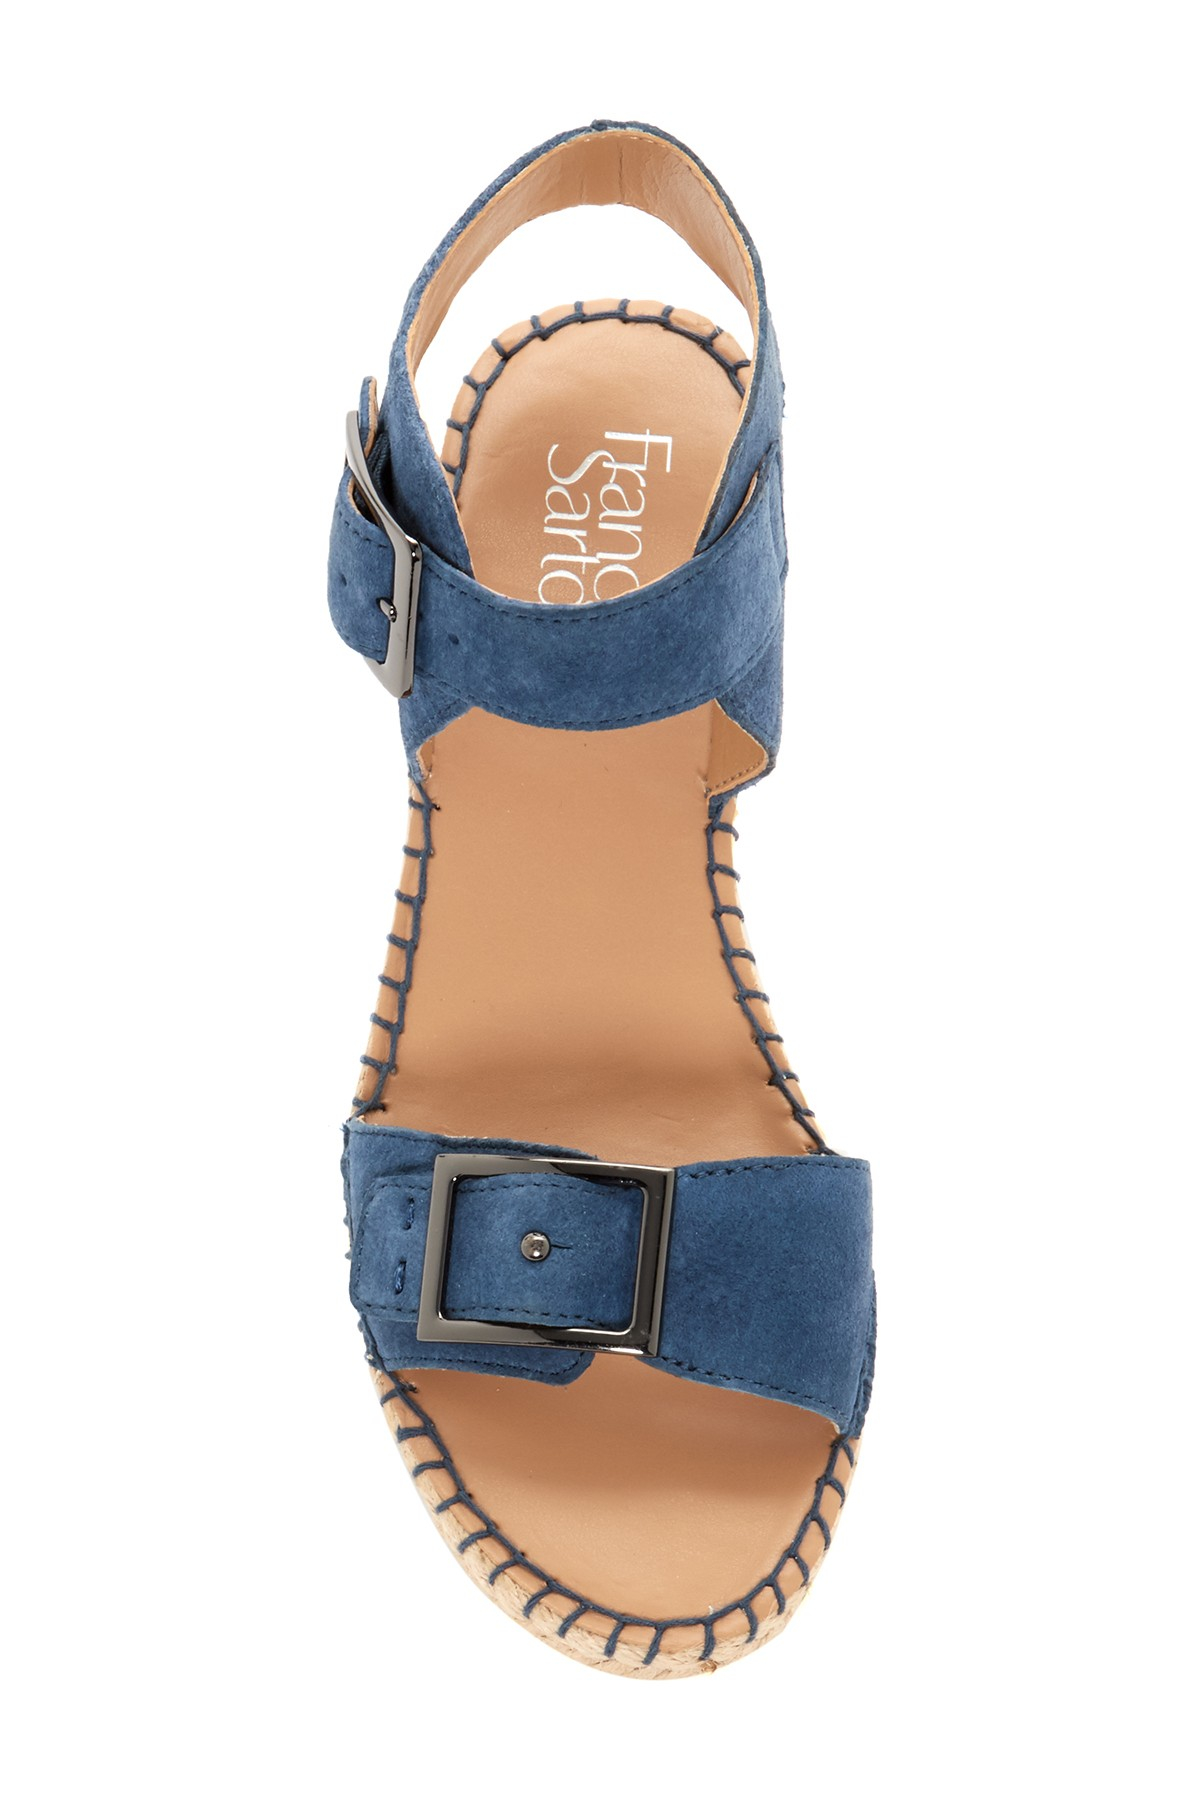 Franco Sarto Navy Blue Shoes